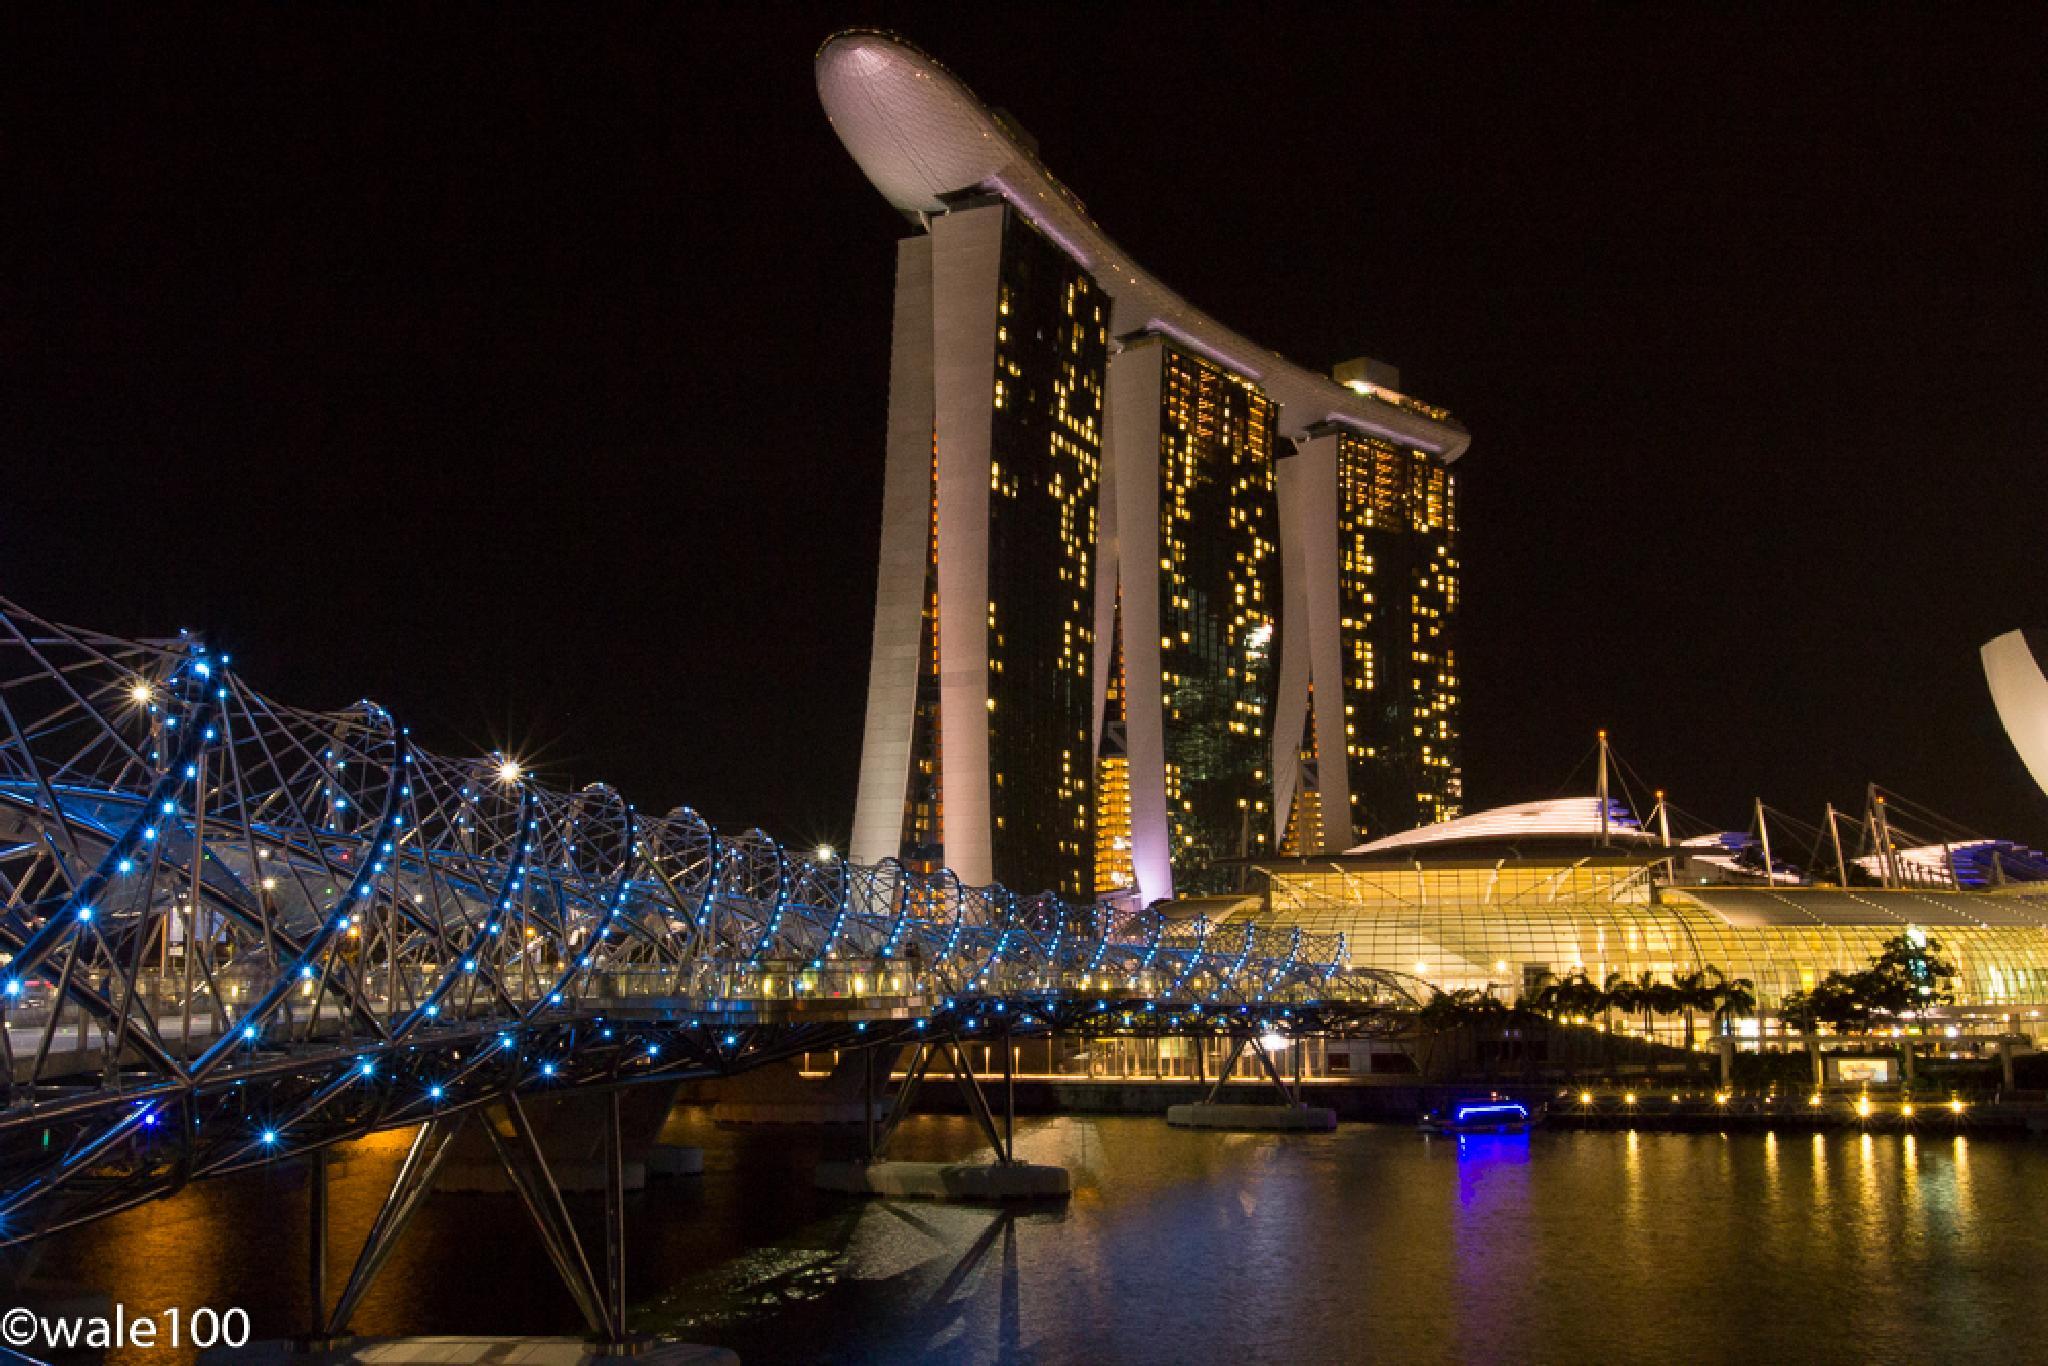 Singapore Marina by wale